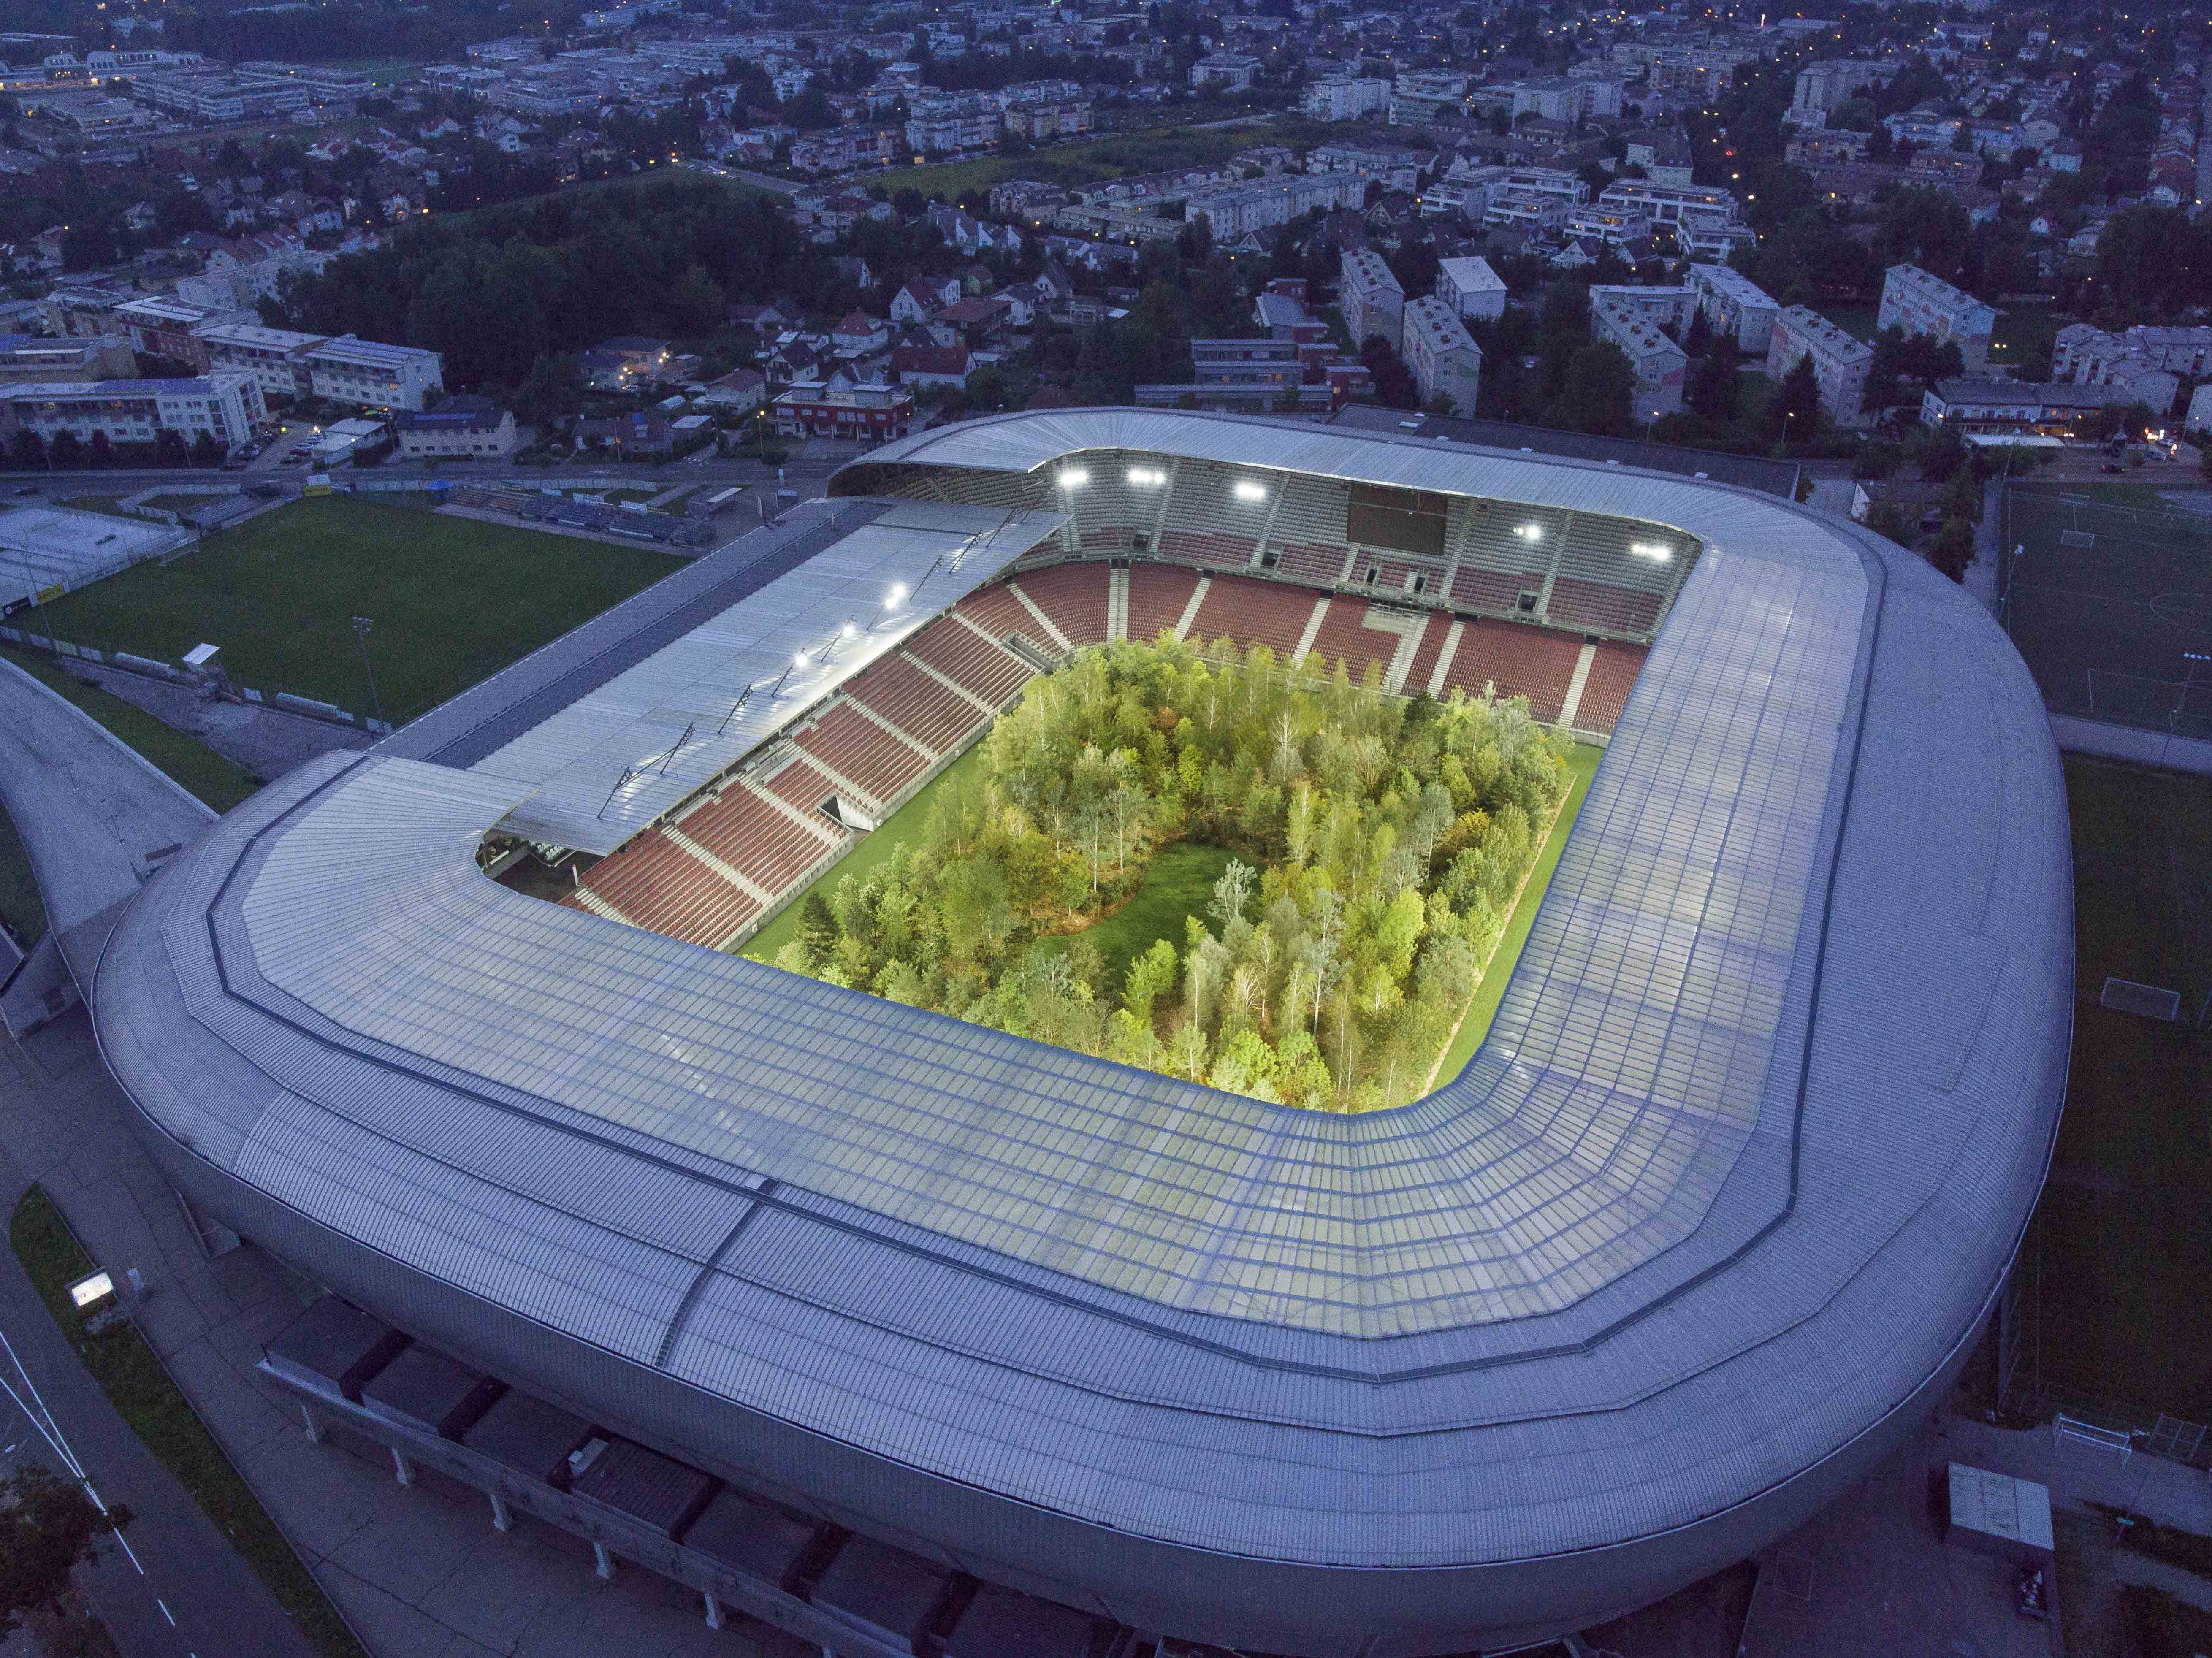 Klaus Littmann For Forest The Unending Attraction Of Nature Wörthersee Stadium Klagenfurt © Unimo 4